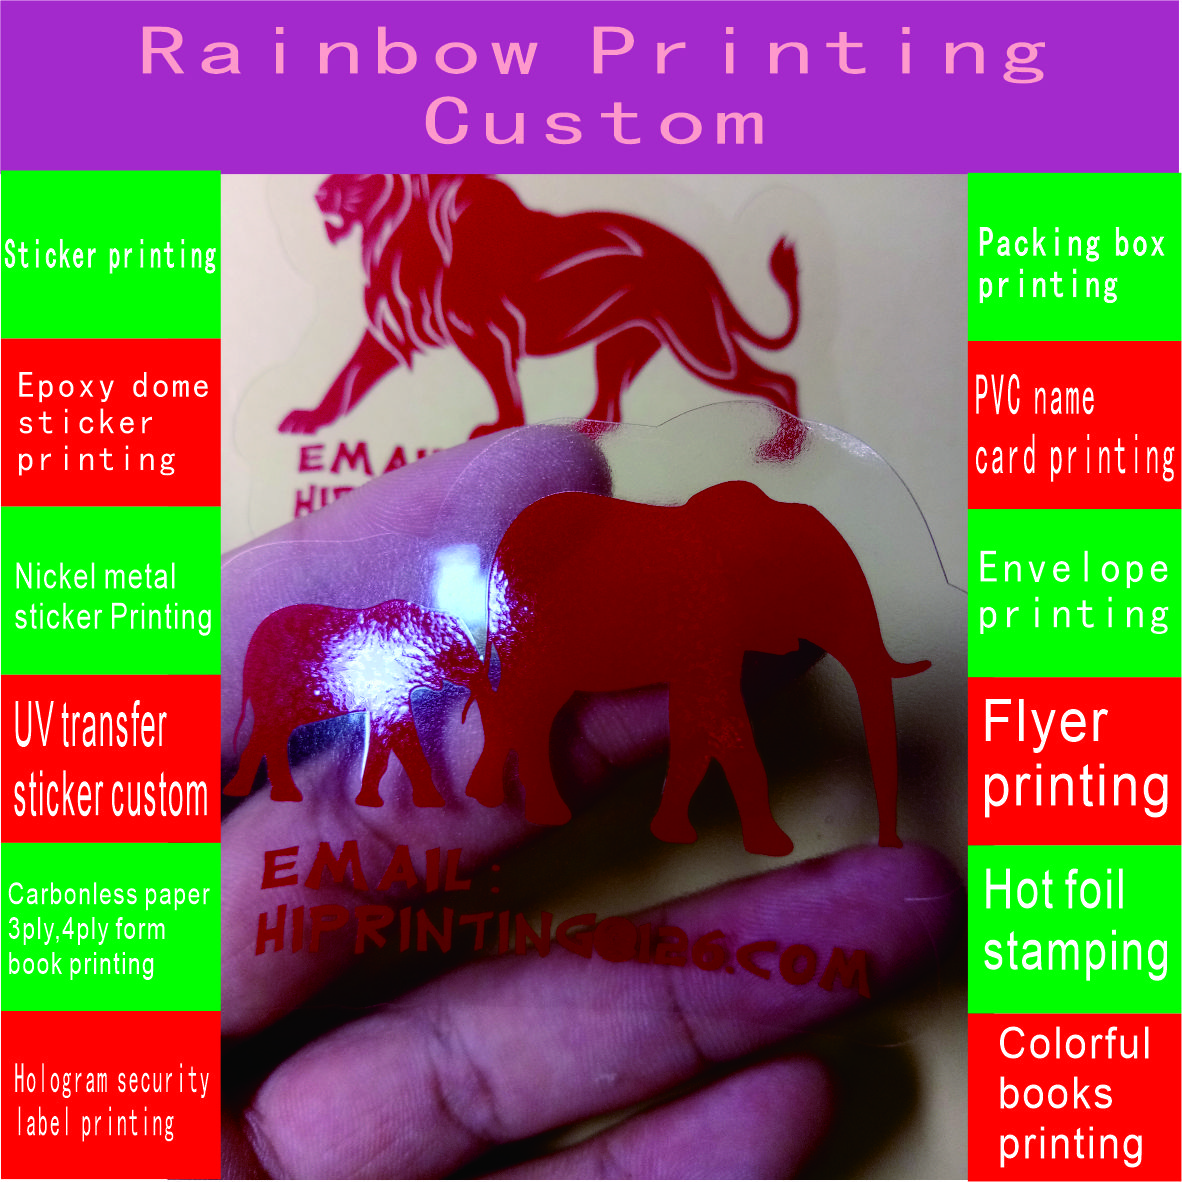 Custom logo printing transparent clear self adhesive vinyl decal PVC label sticker